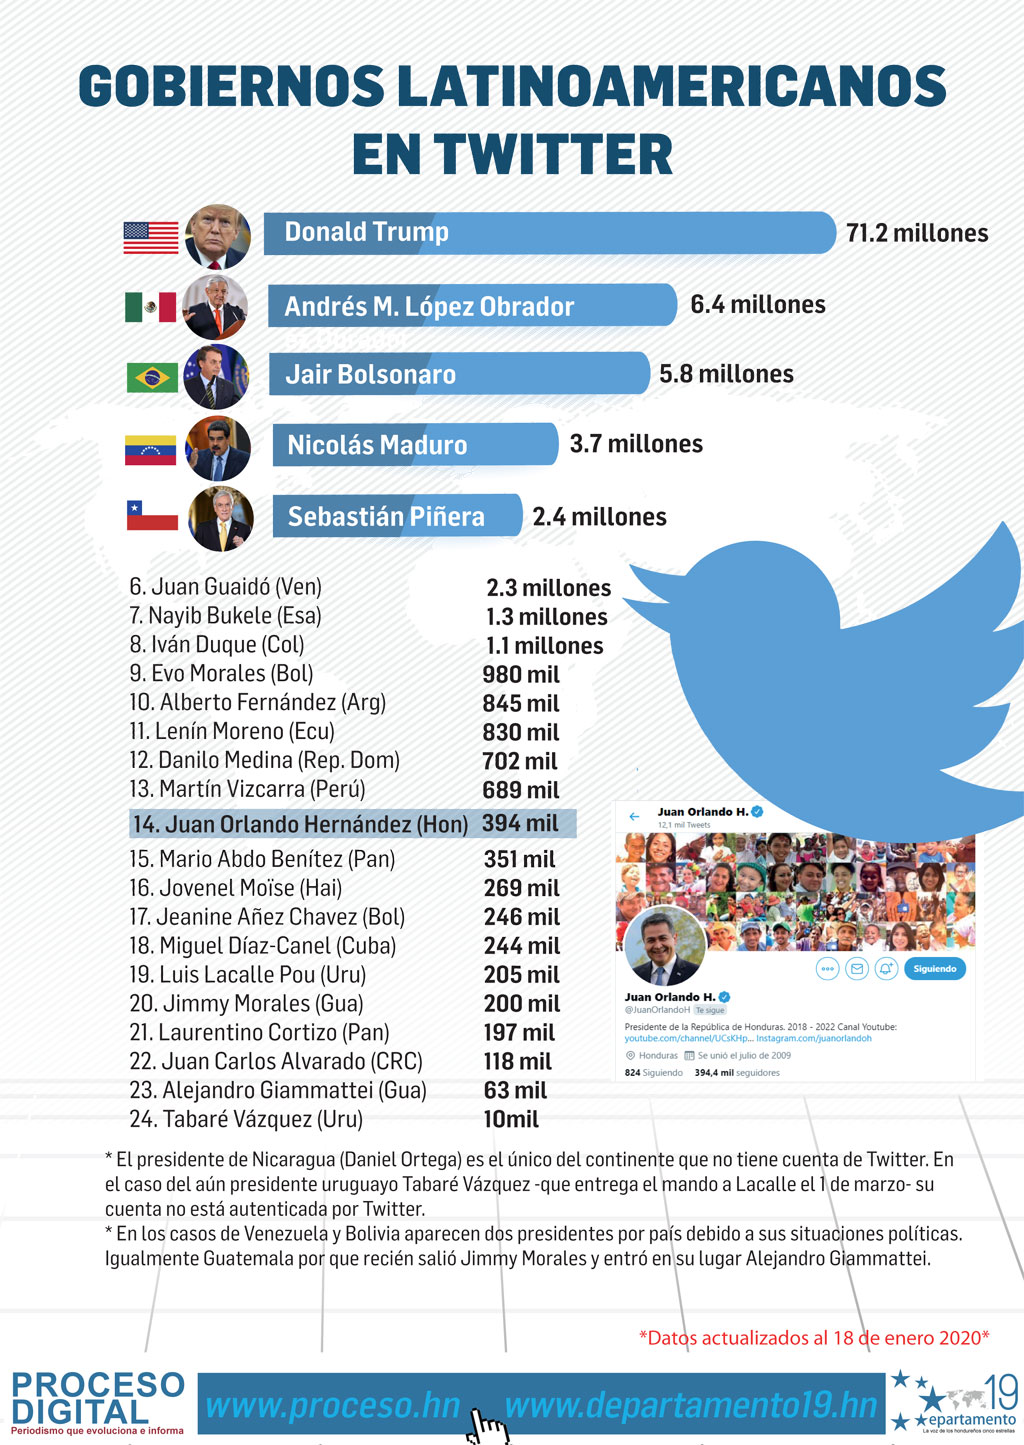 Gobiernos latinoamericanos en Twitter